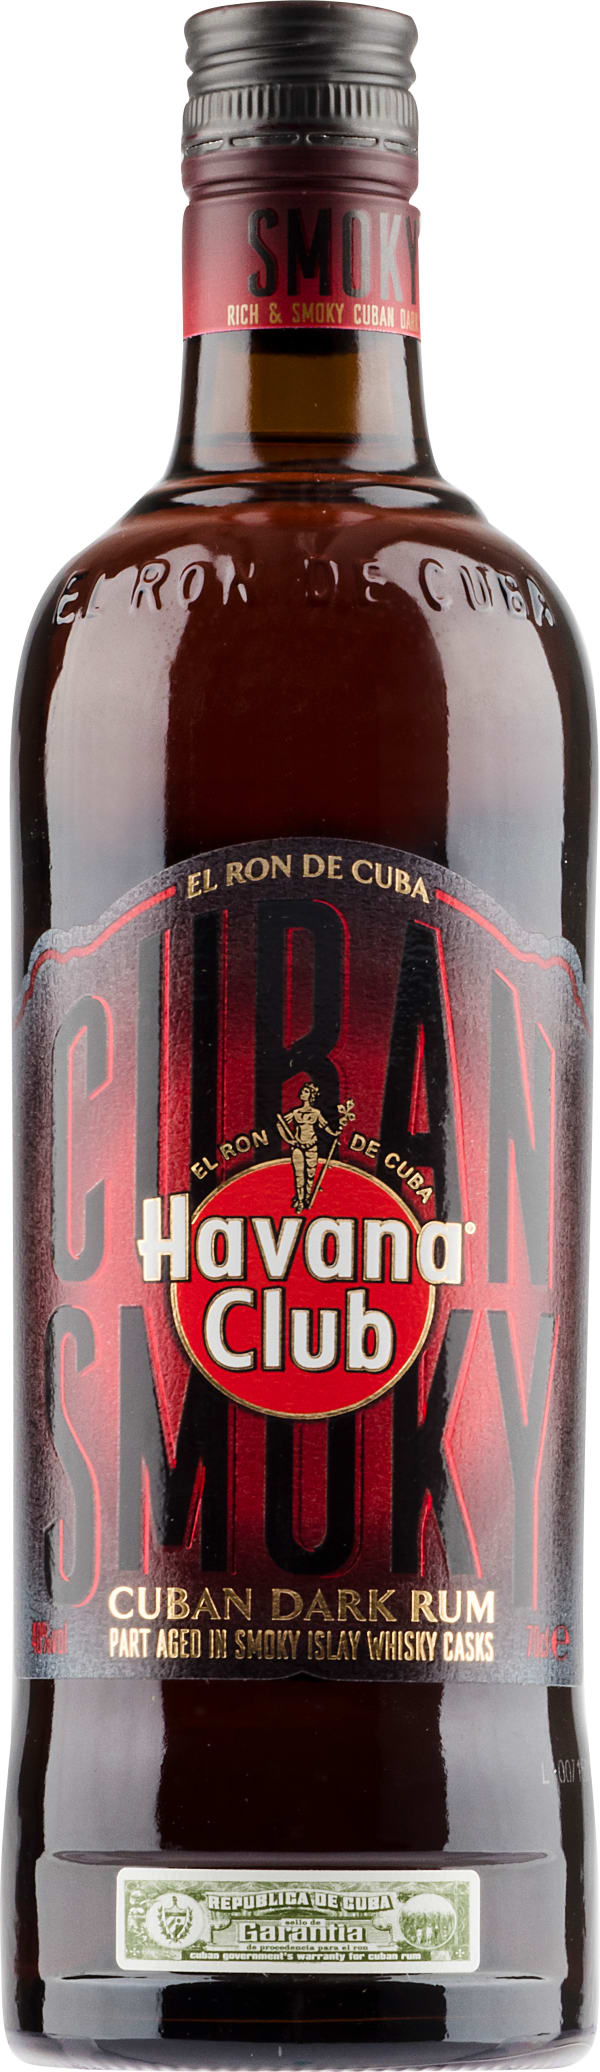 Havana Club Cuban Smoky